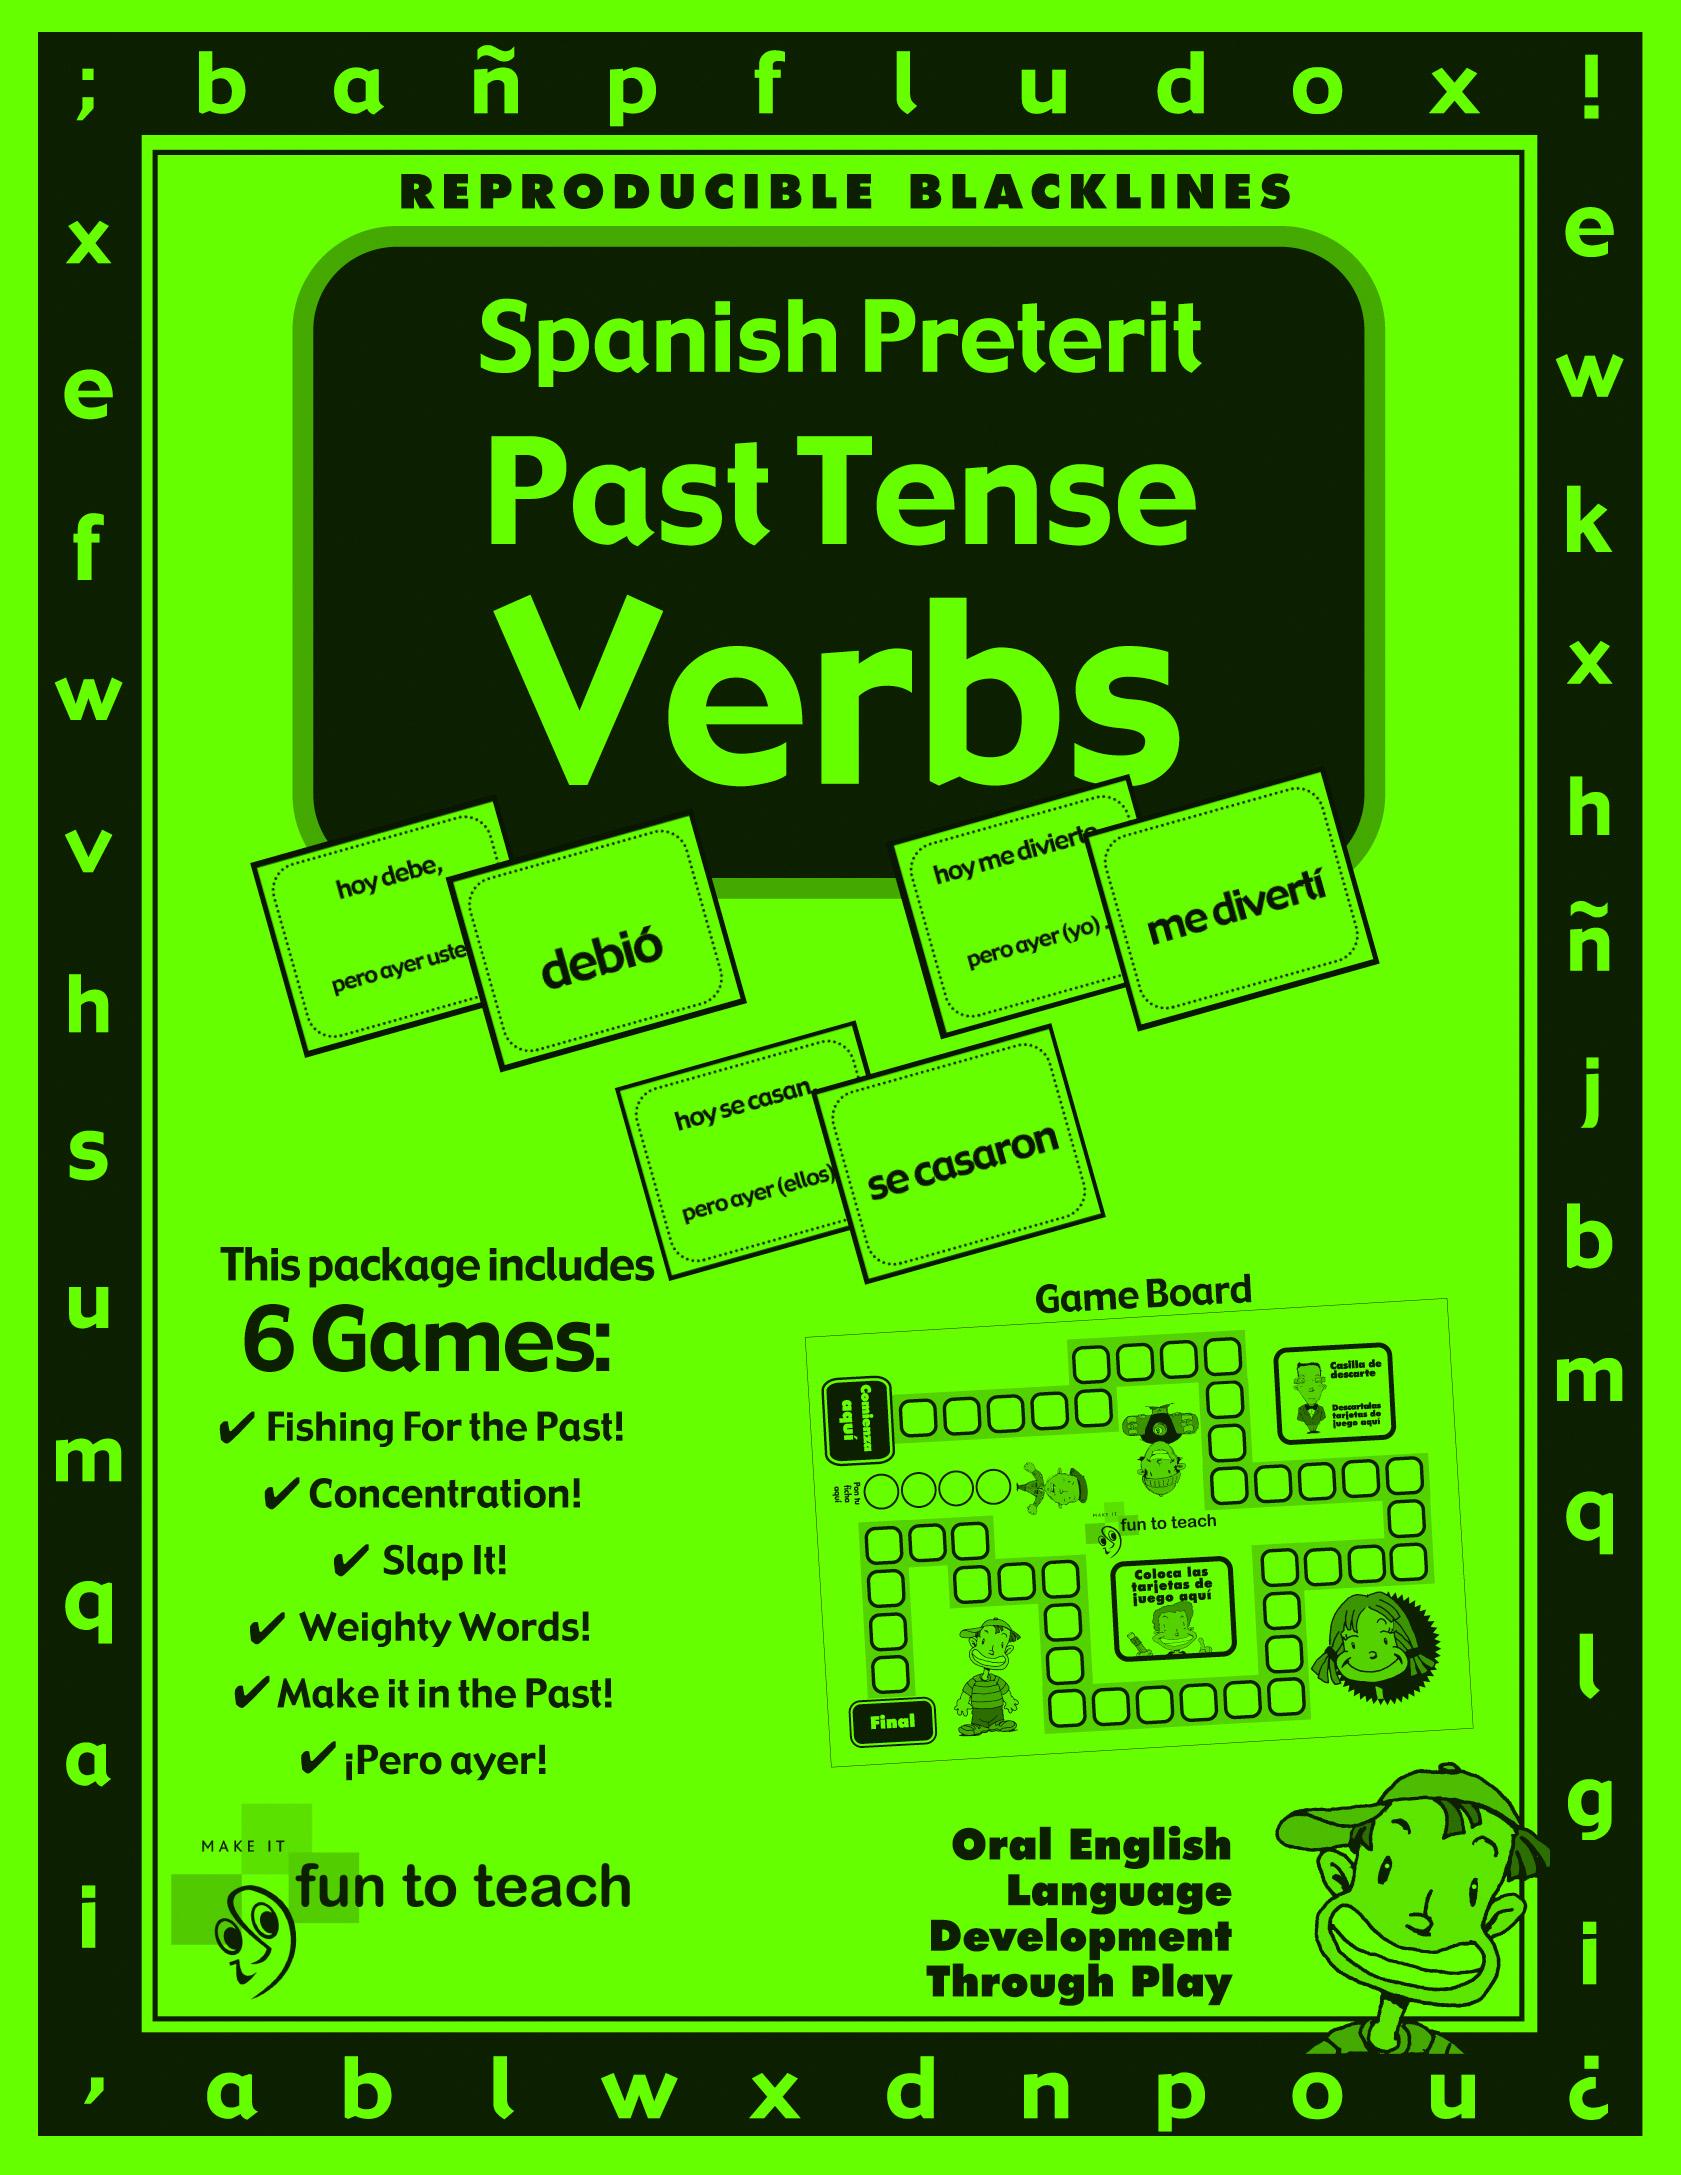 Spanish Preterite Past Tense Verbs